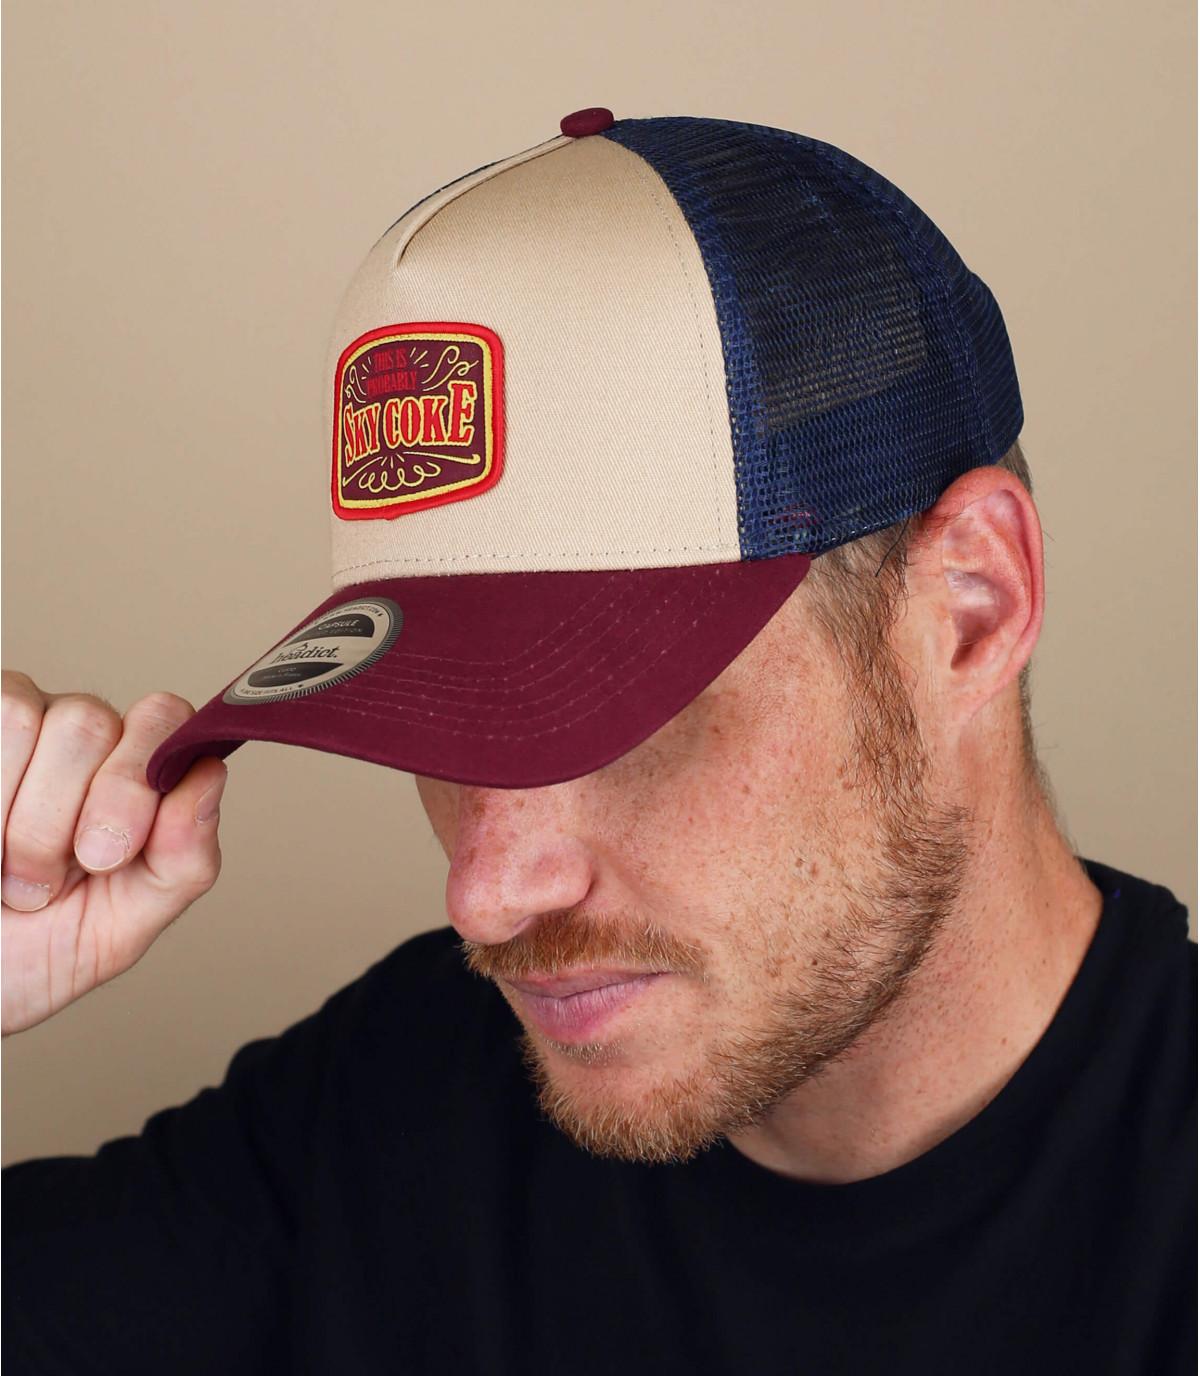 burgundy Sky Coke trucker cap